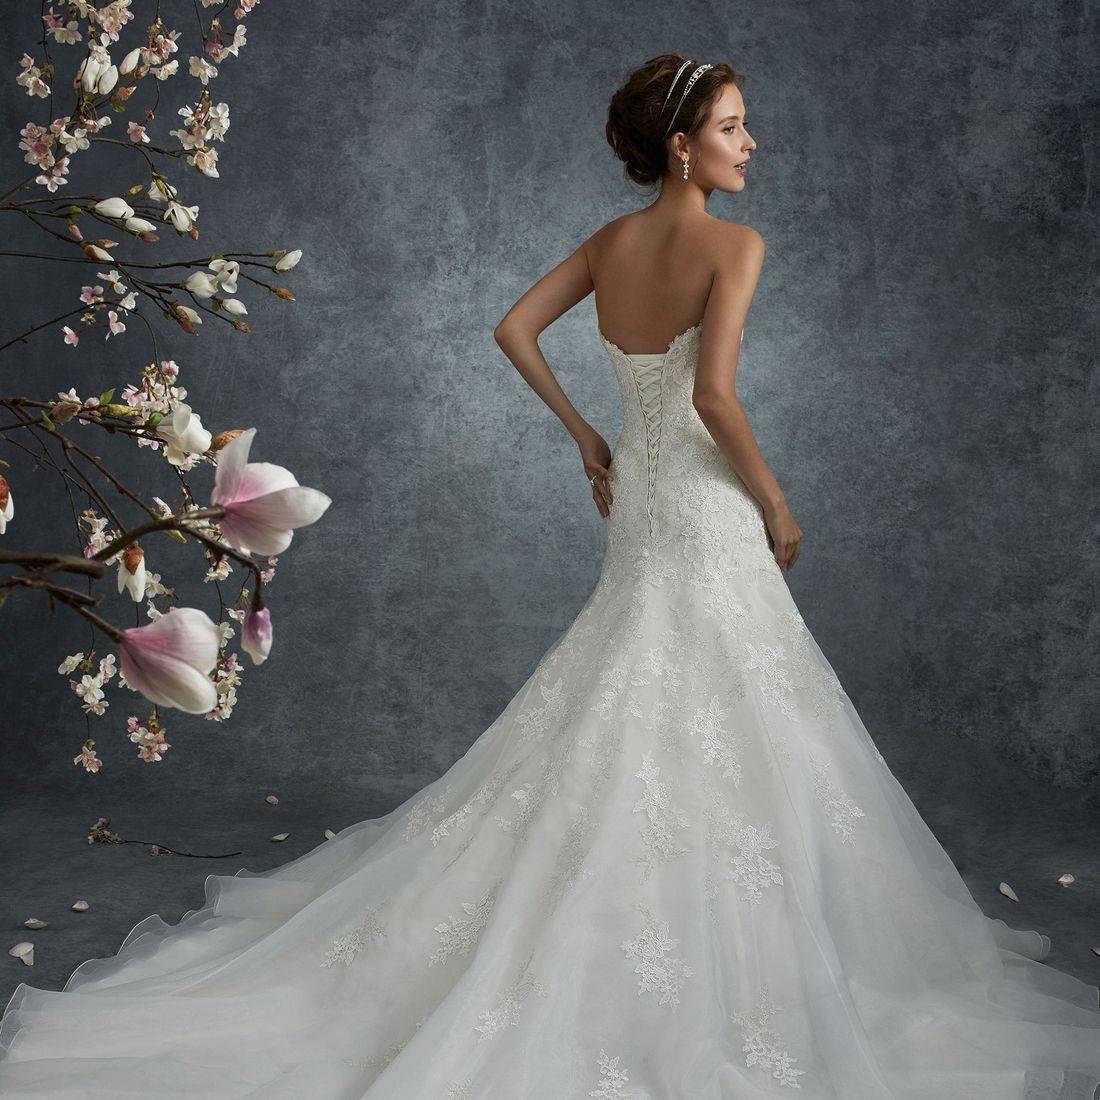 Sophia Tolli, sophia tolli wedding dress, a line wedding dress, fit and flare wedding dress, side panel wedding dress, chapel length train, lace, sparkle, sweetheart neckline, lace up back, corset back